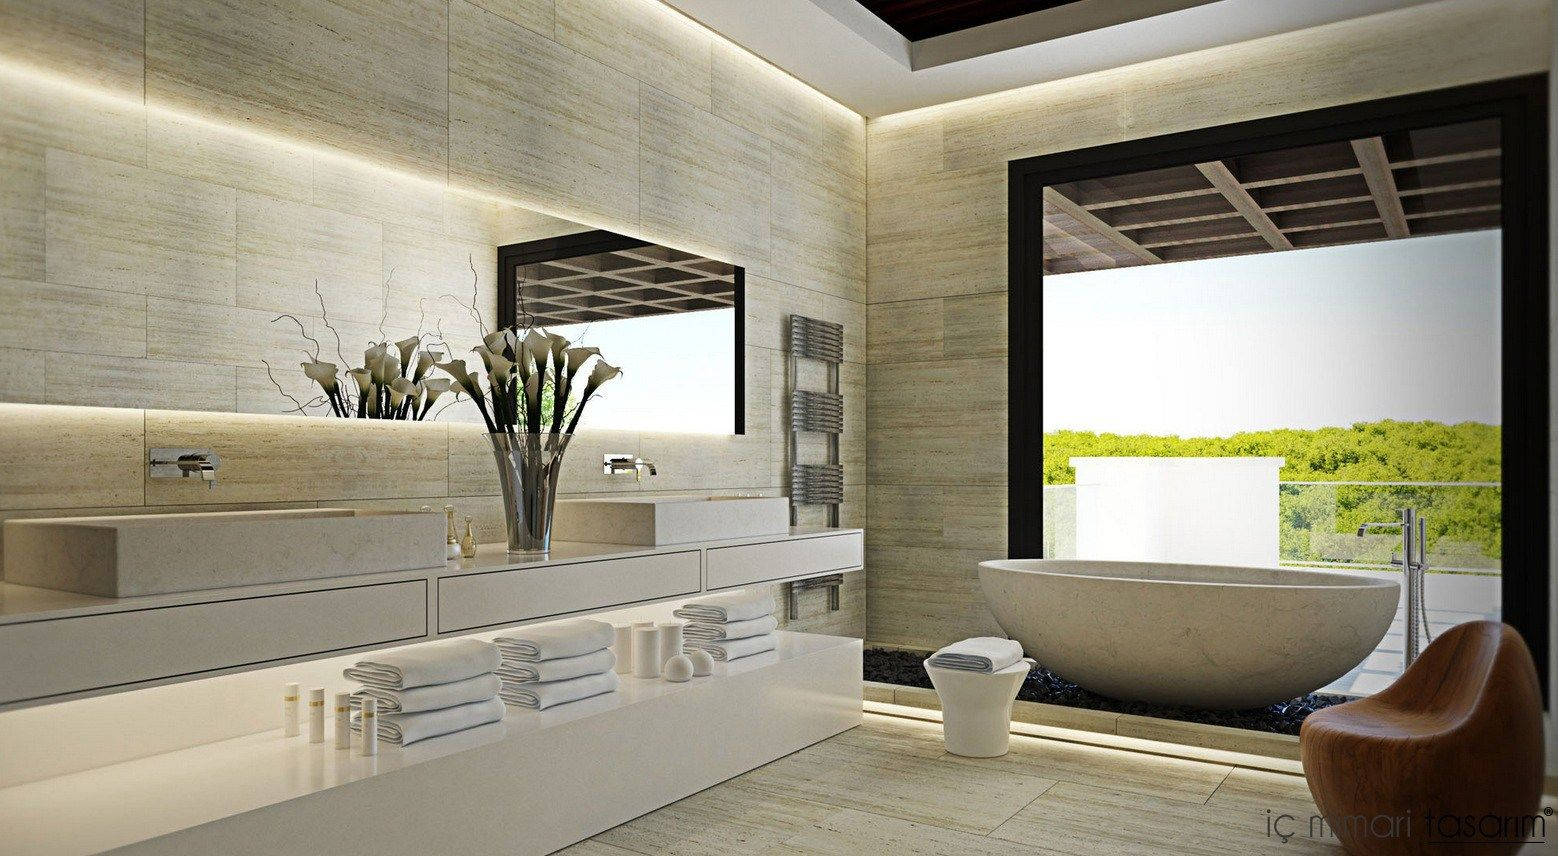 Villa iç tasarım Googleuda Ara R PANO Pinterest Searching